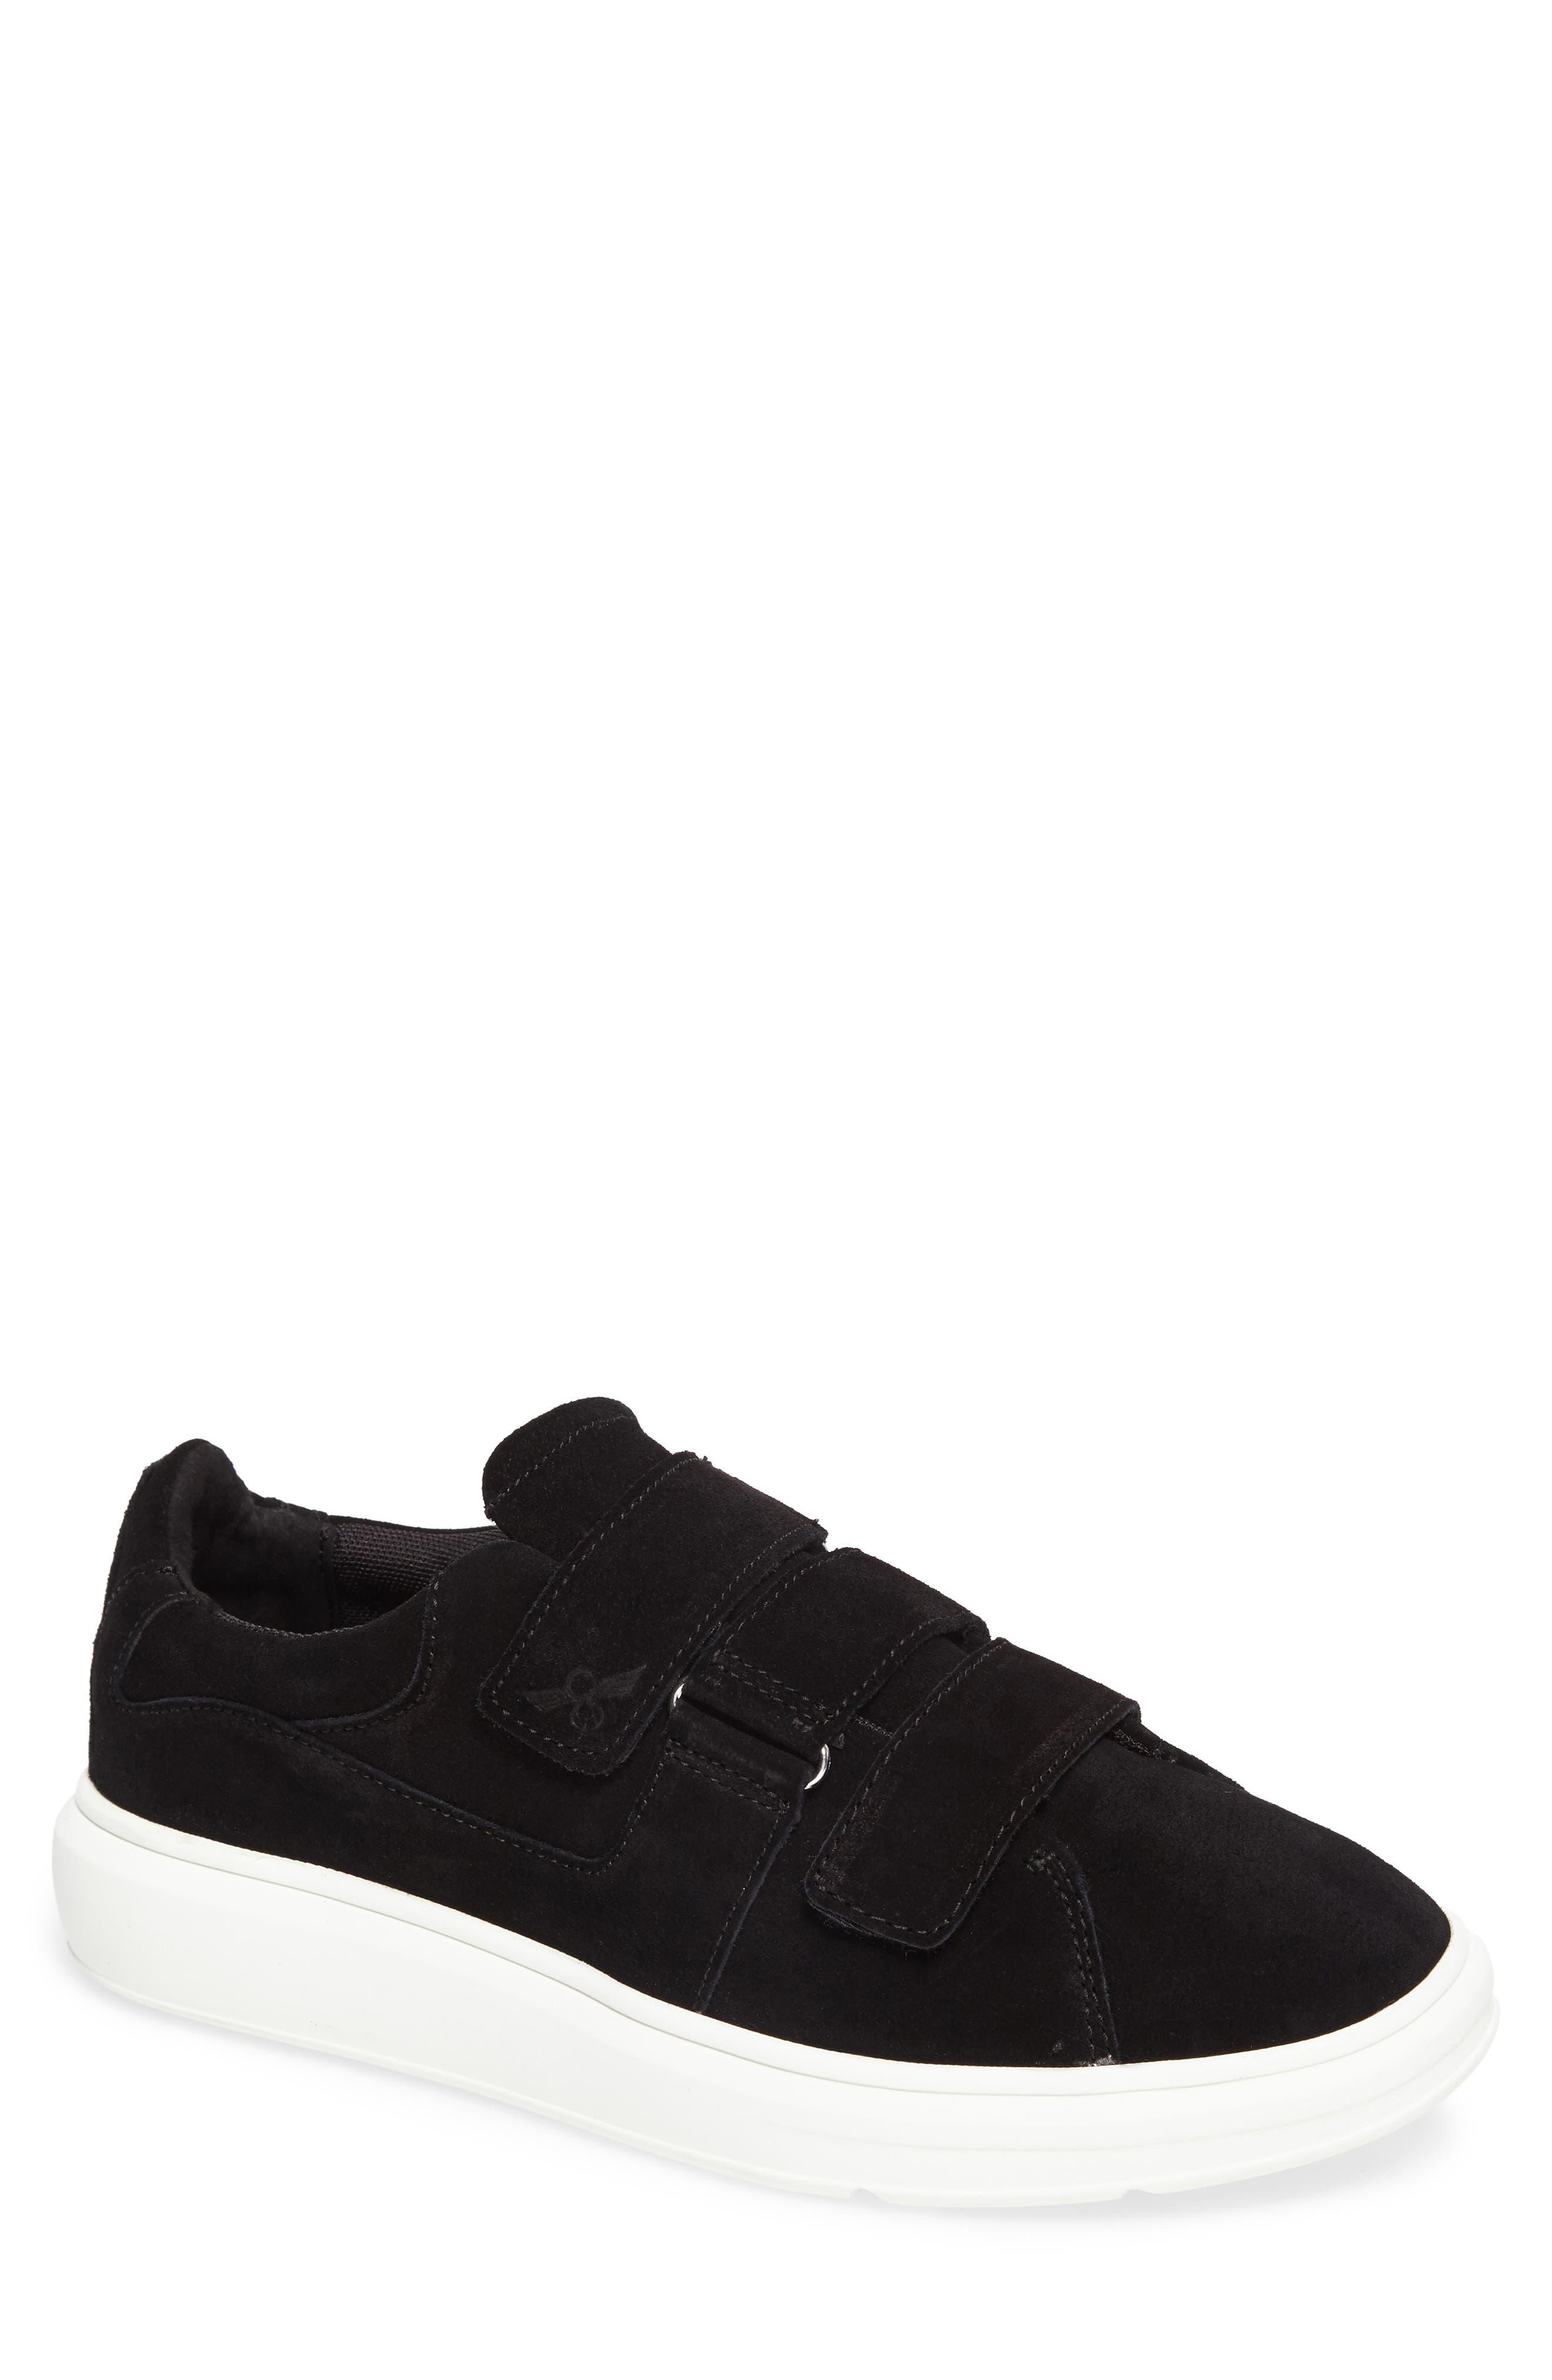 Meleti Sneaker,                         Main,                         color, 001